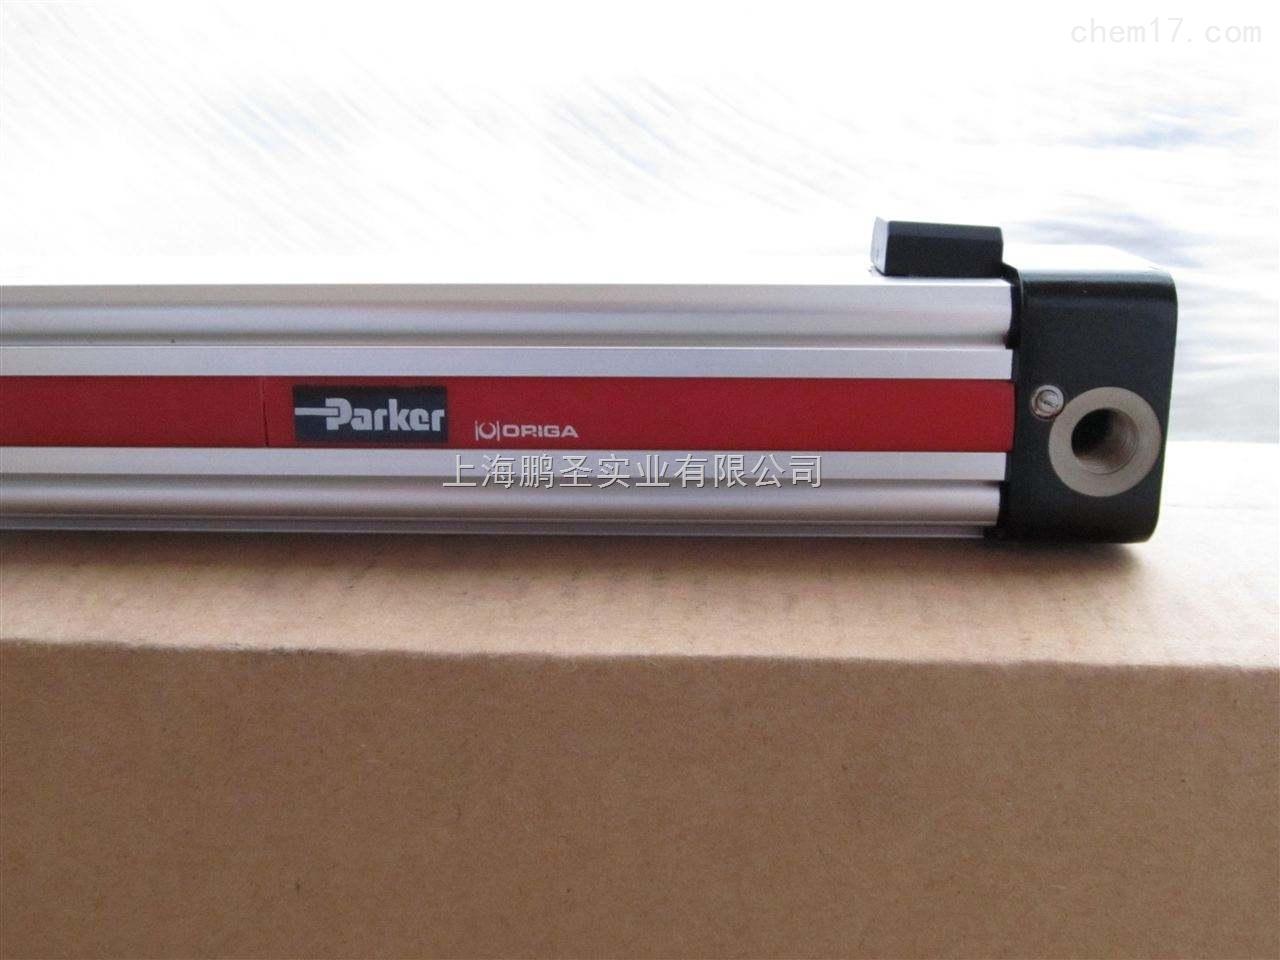 P1D-BT040MC-0100派克parker气缸现货报价